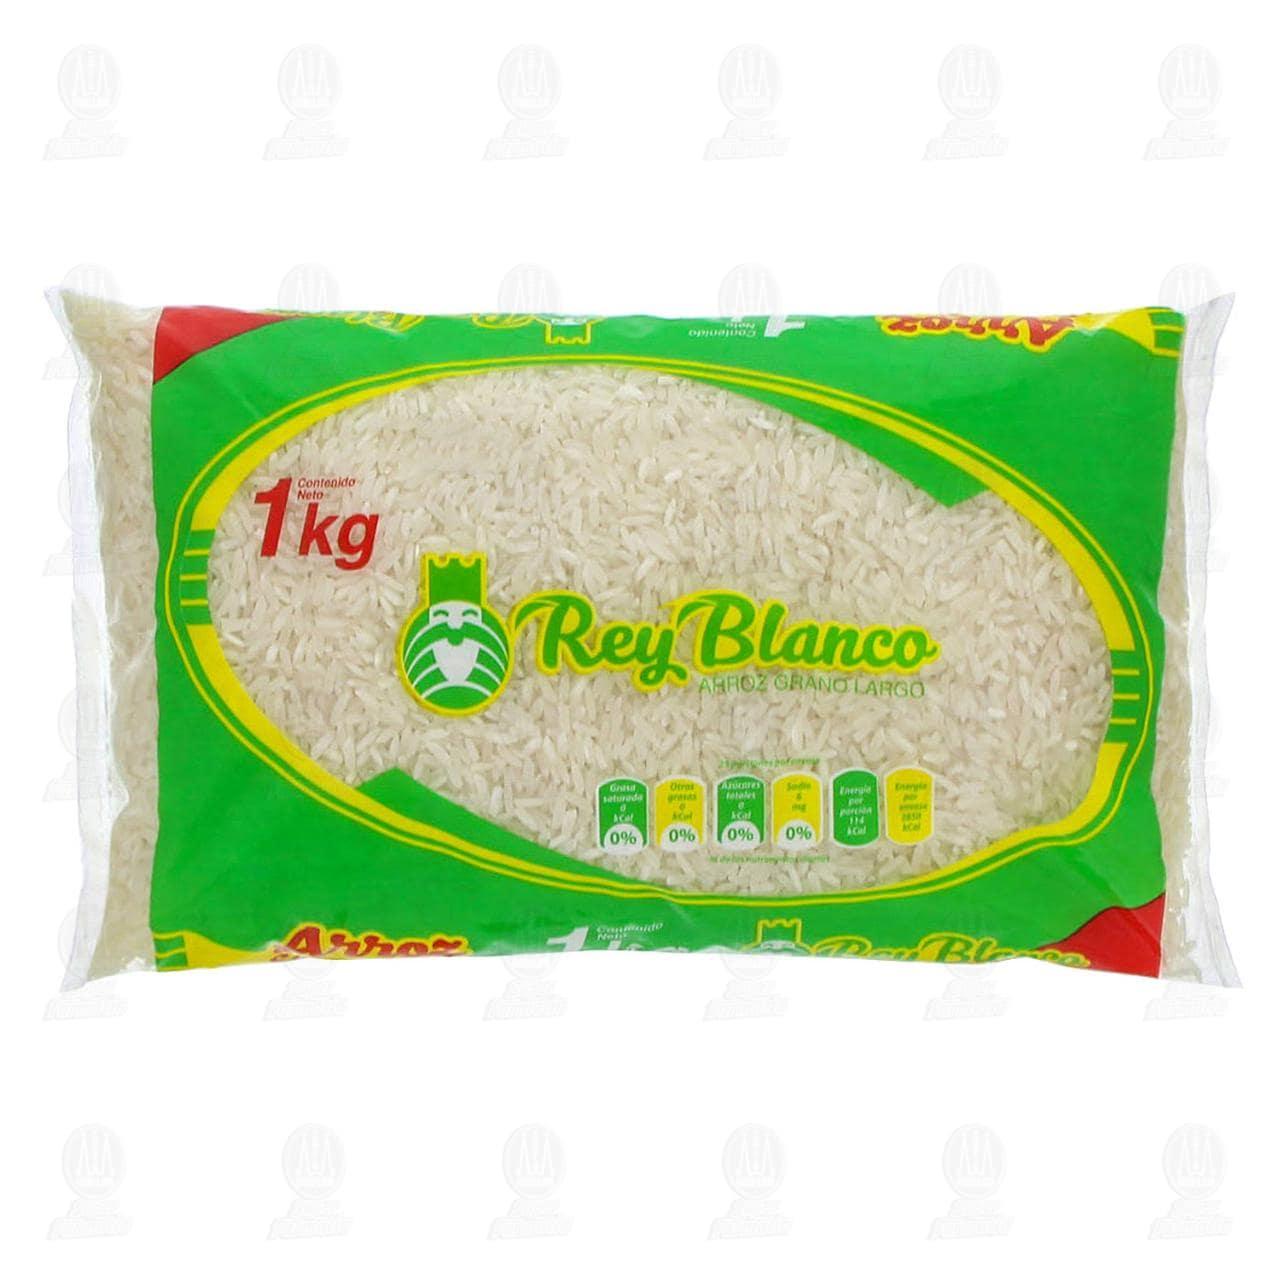 Arroz Grano Largo Rey Blanco, 1 kg.